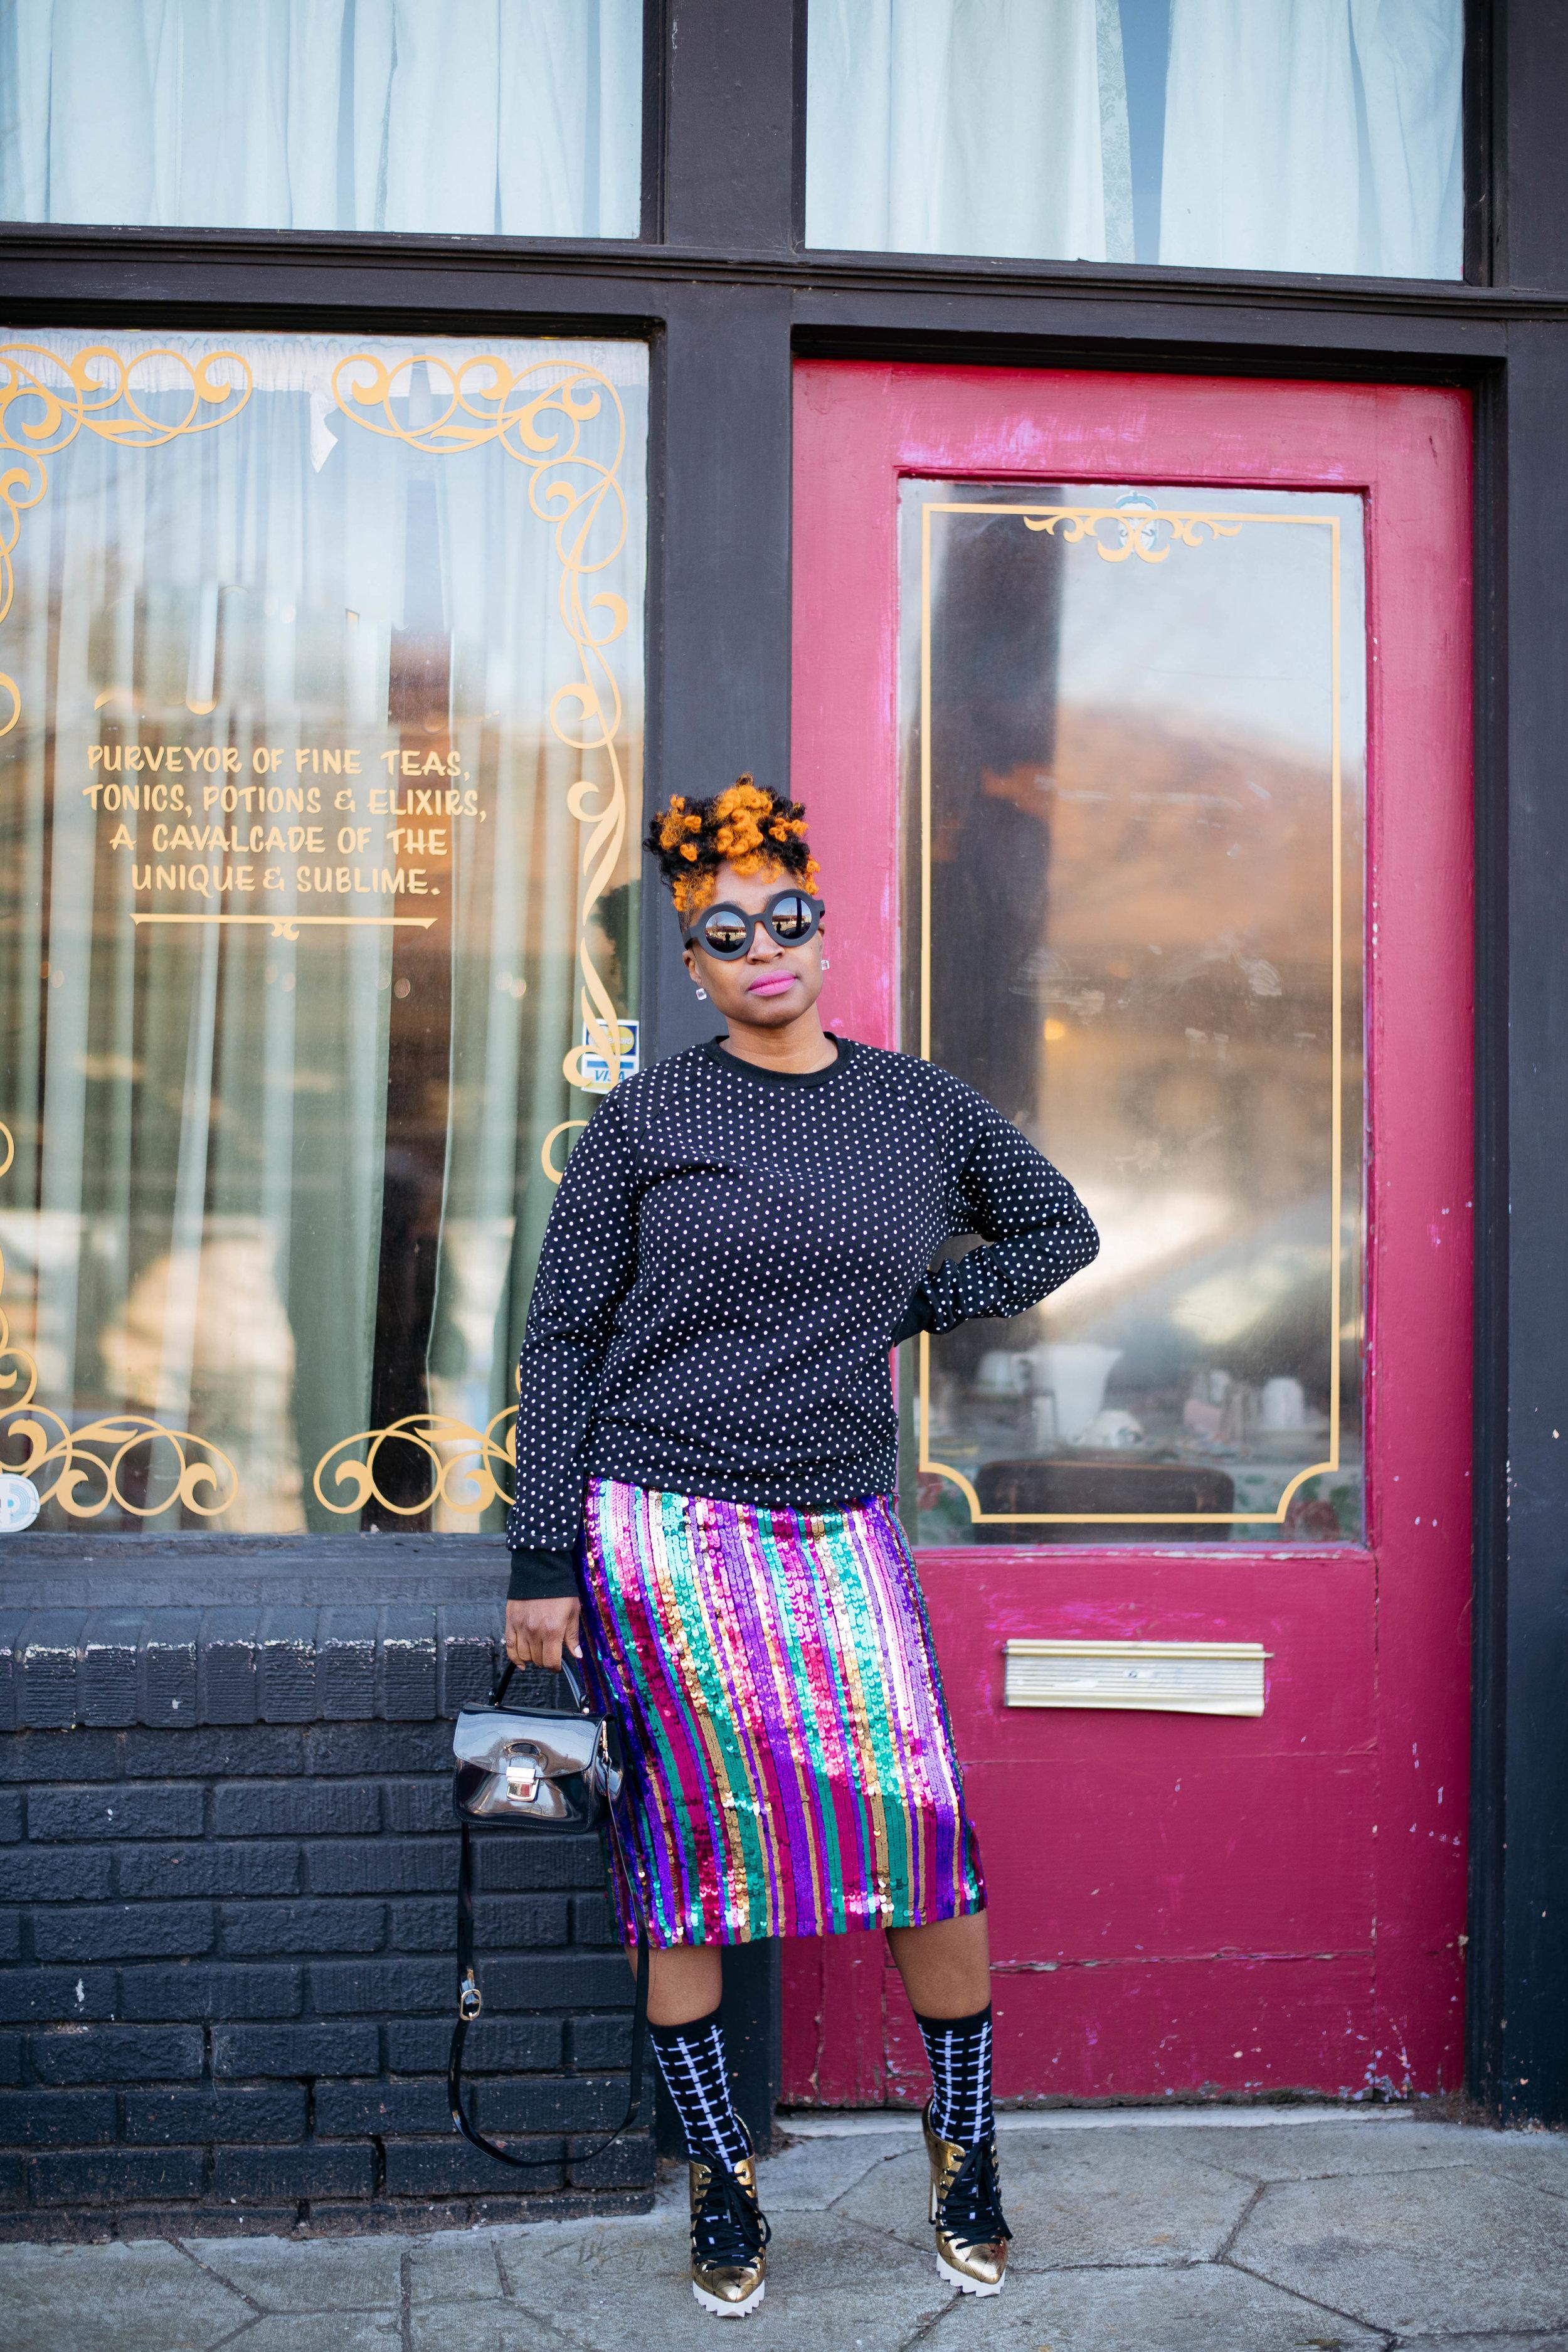 Sequin Skirt + Polka Dot Sweatshirt, Atlanta top blogger, Atlanta personal shopper